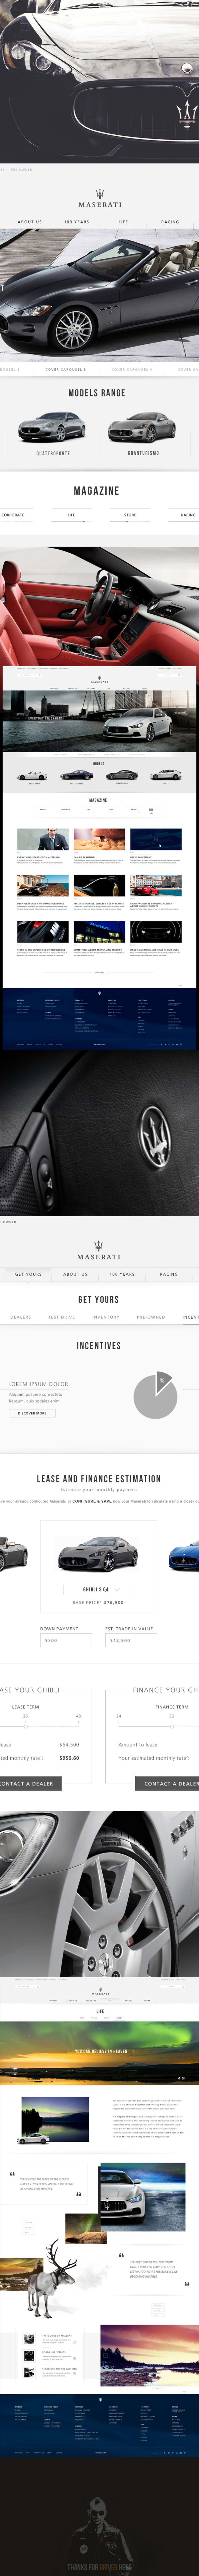 Maserati -1